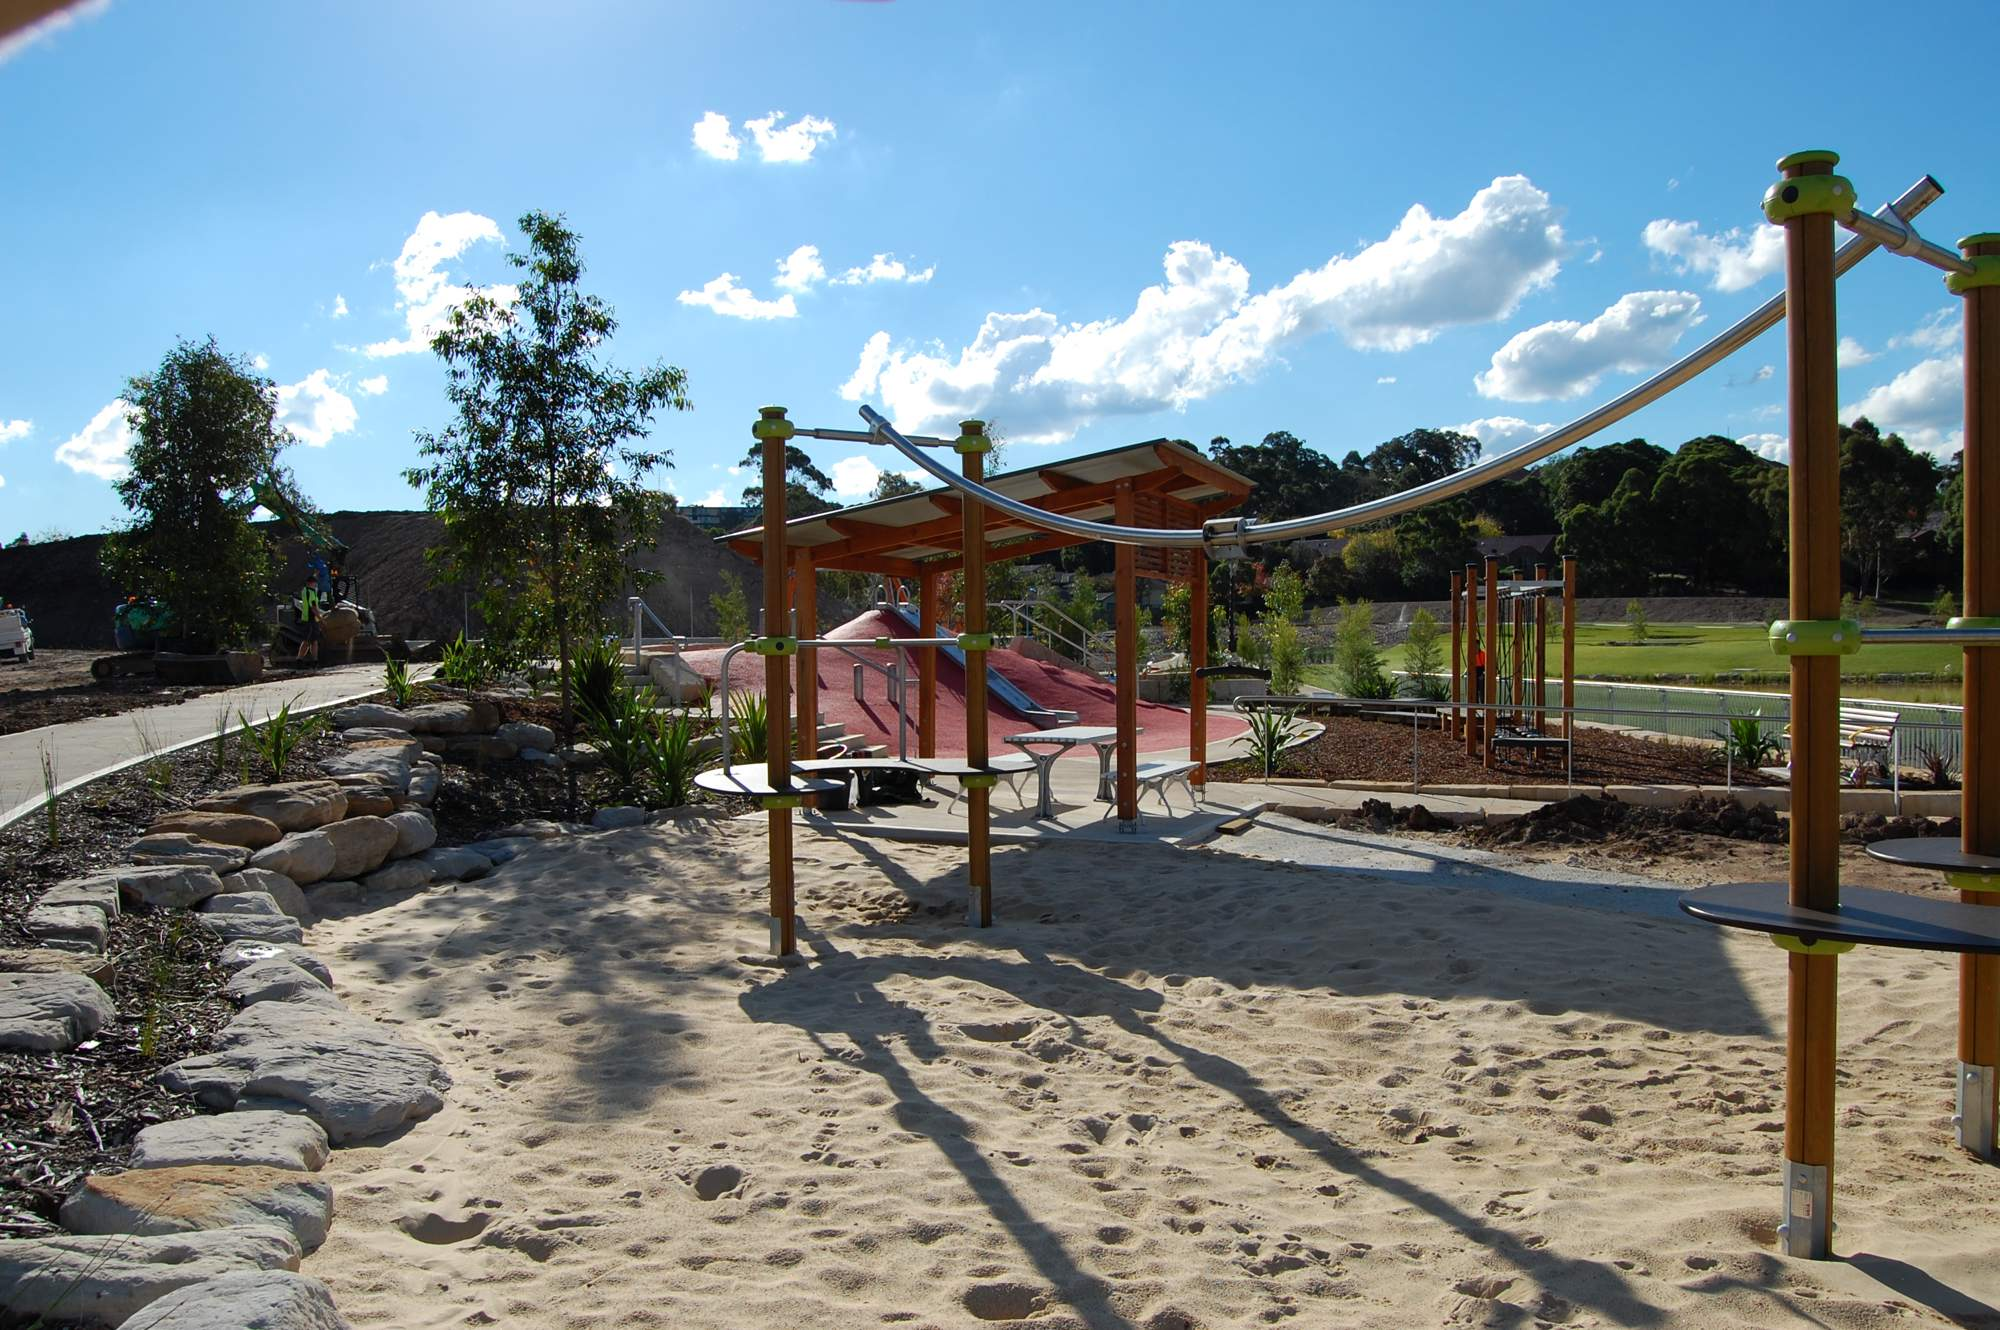 Lardelli Park